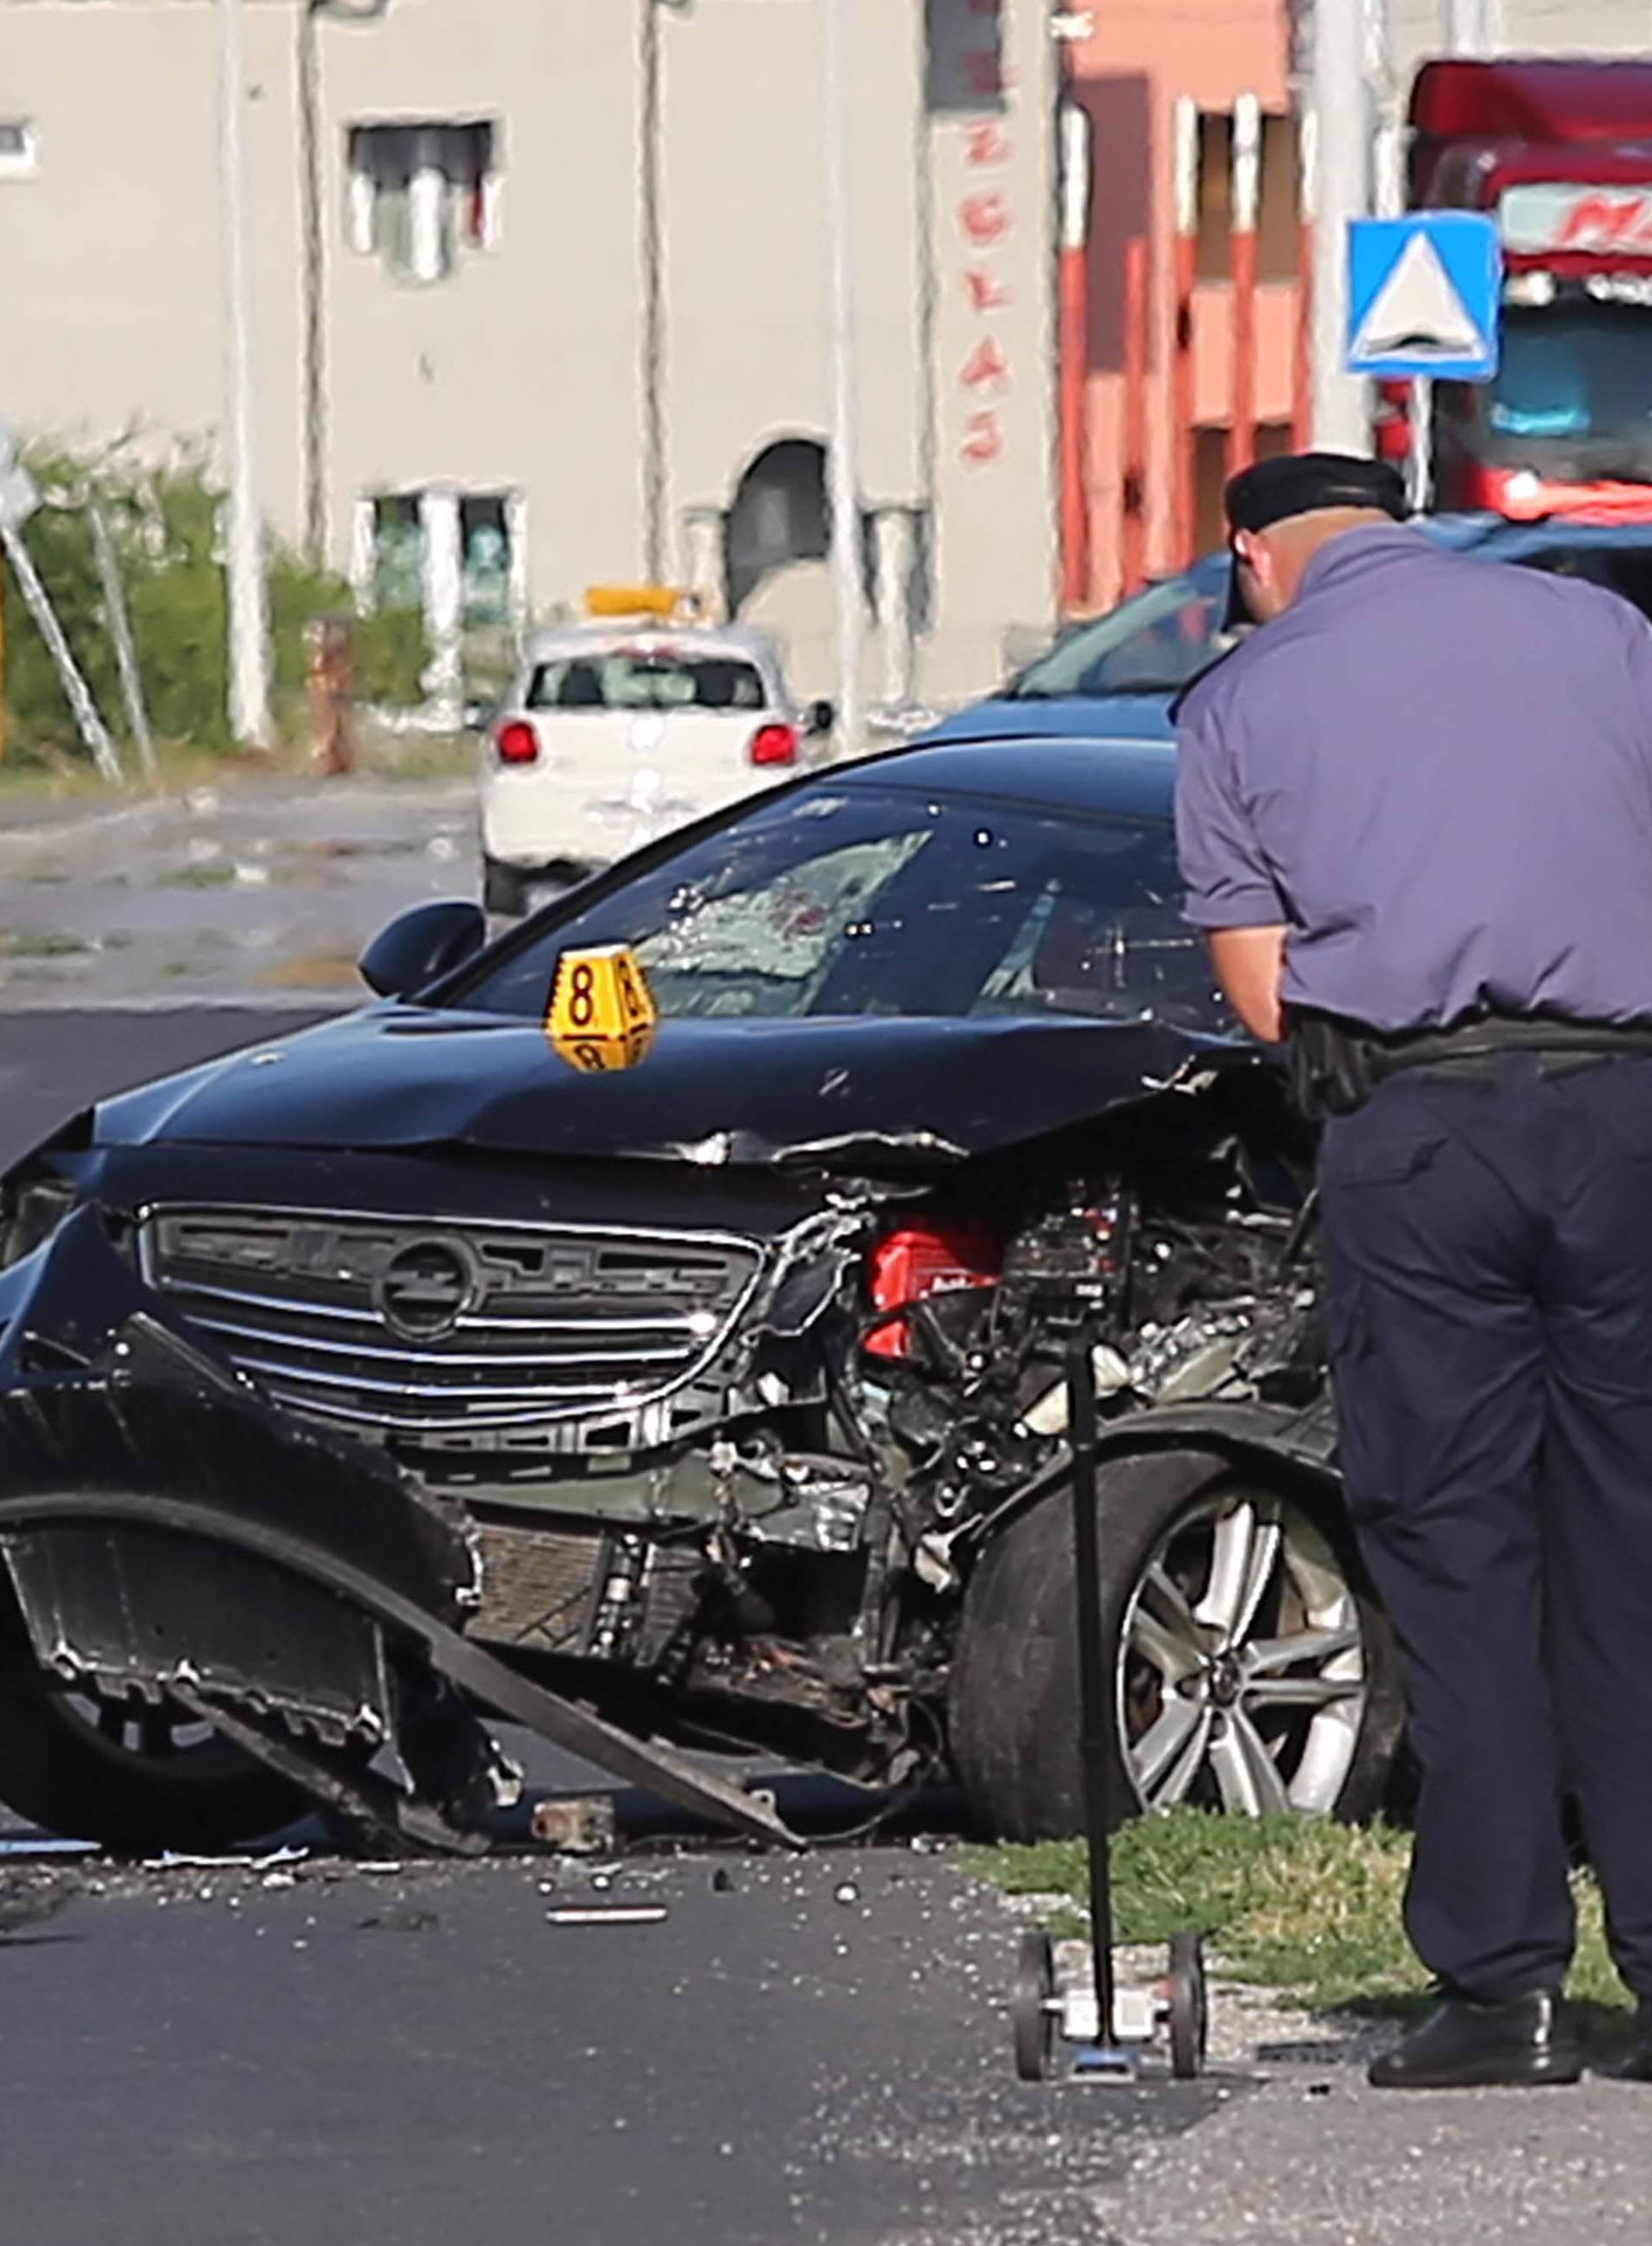 Frontalni sudar: Vozač kriv za nesreću u Sesvetama bio pijan